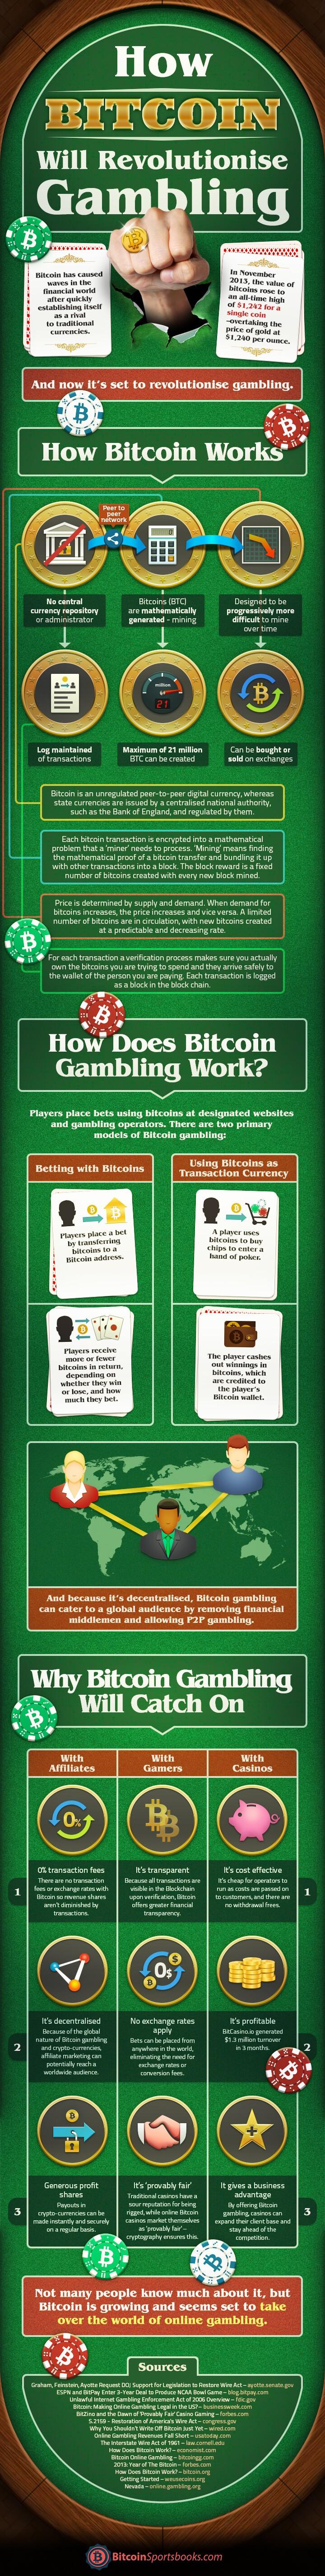 How Bitcoin will revolutionise gambling [infographic